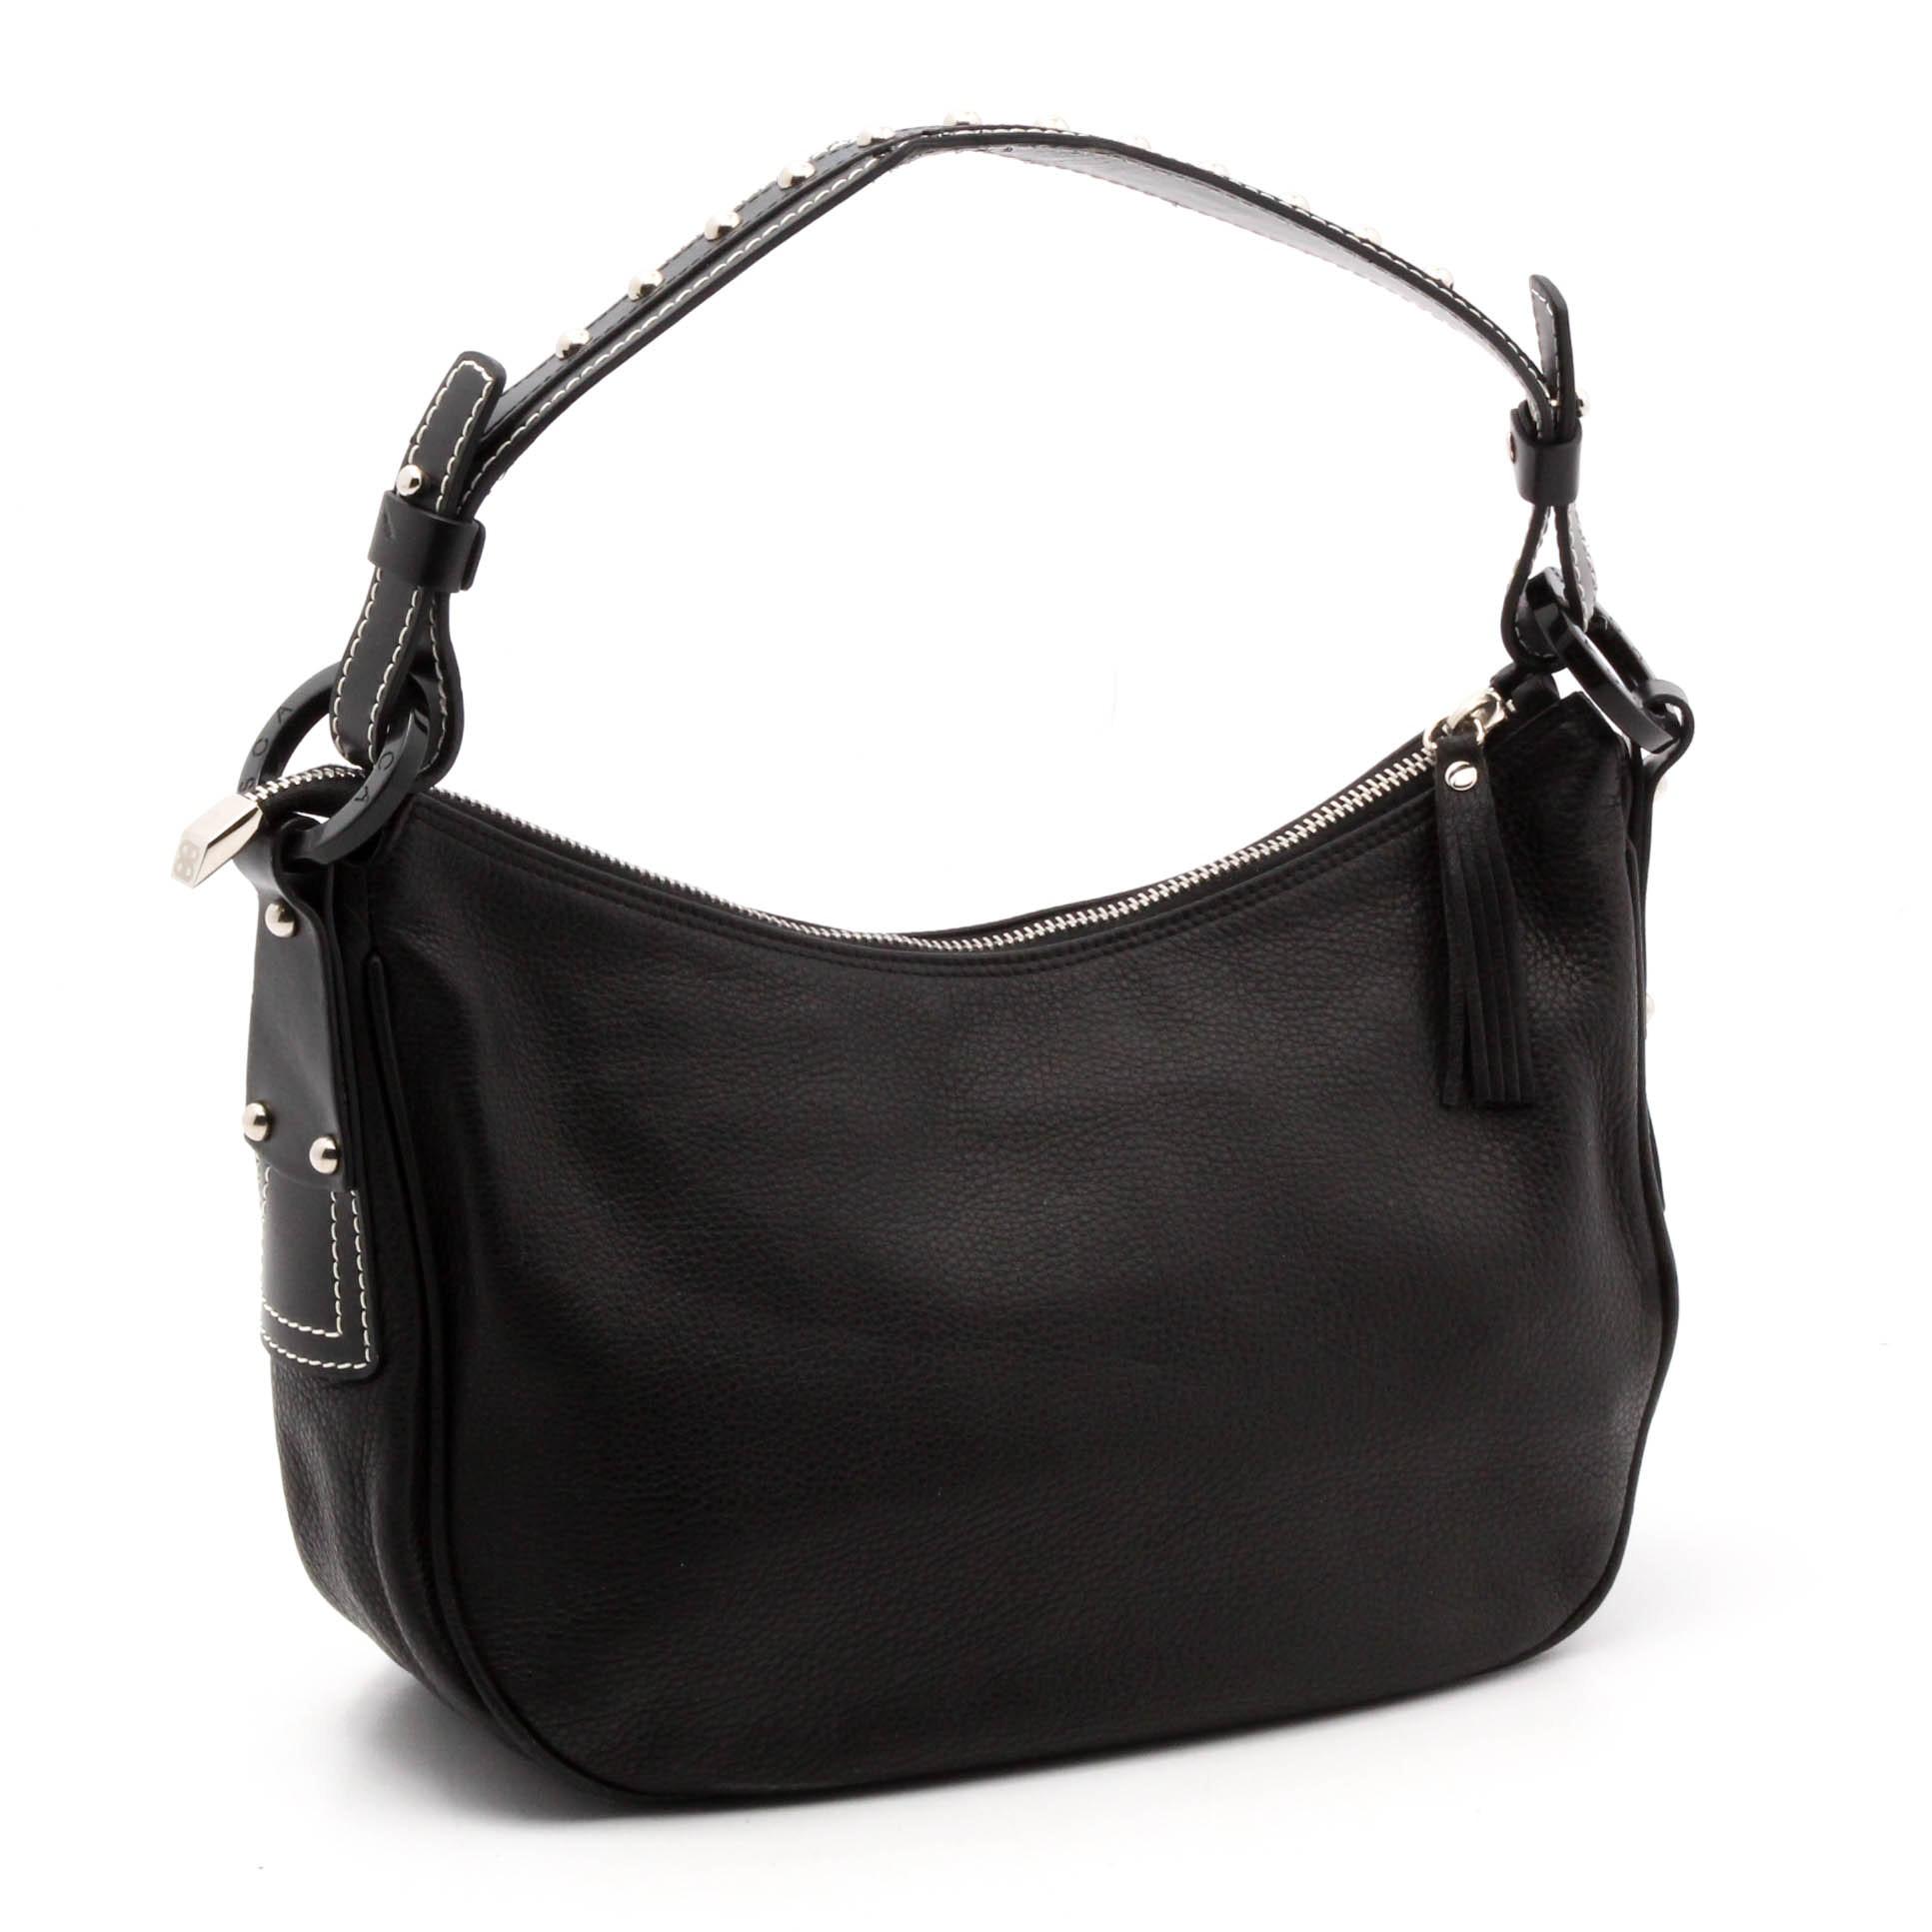 Bosca Black Pebbled Leather Handbag